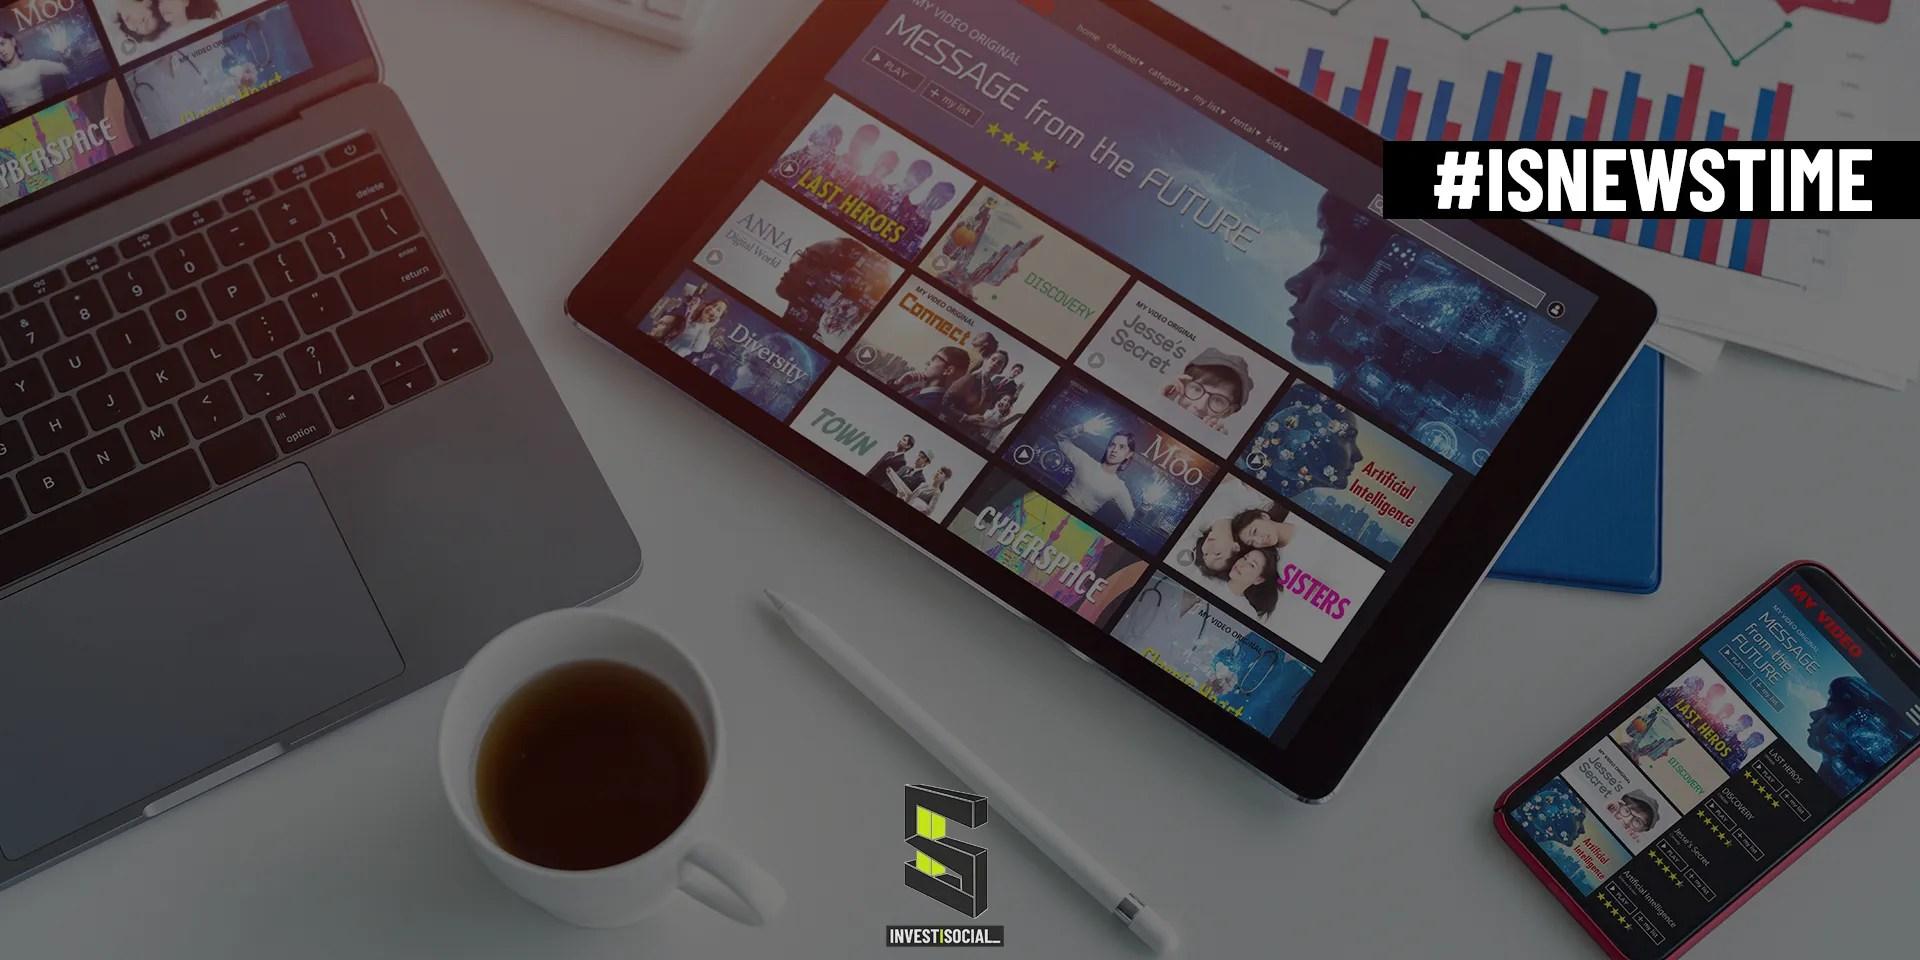 Blog-InvestiSocial-Rubrica-Notizie-Settimanali-ISnewstime